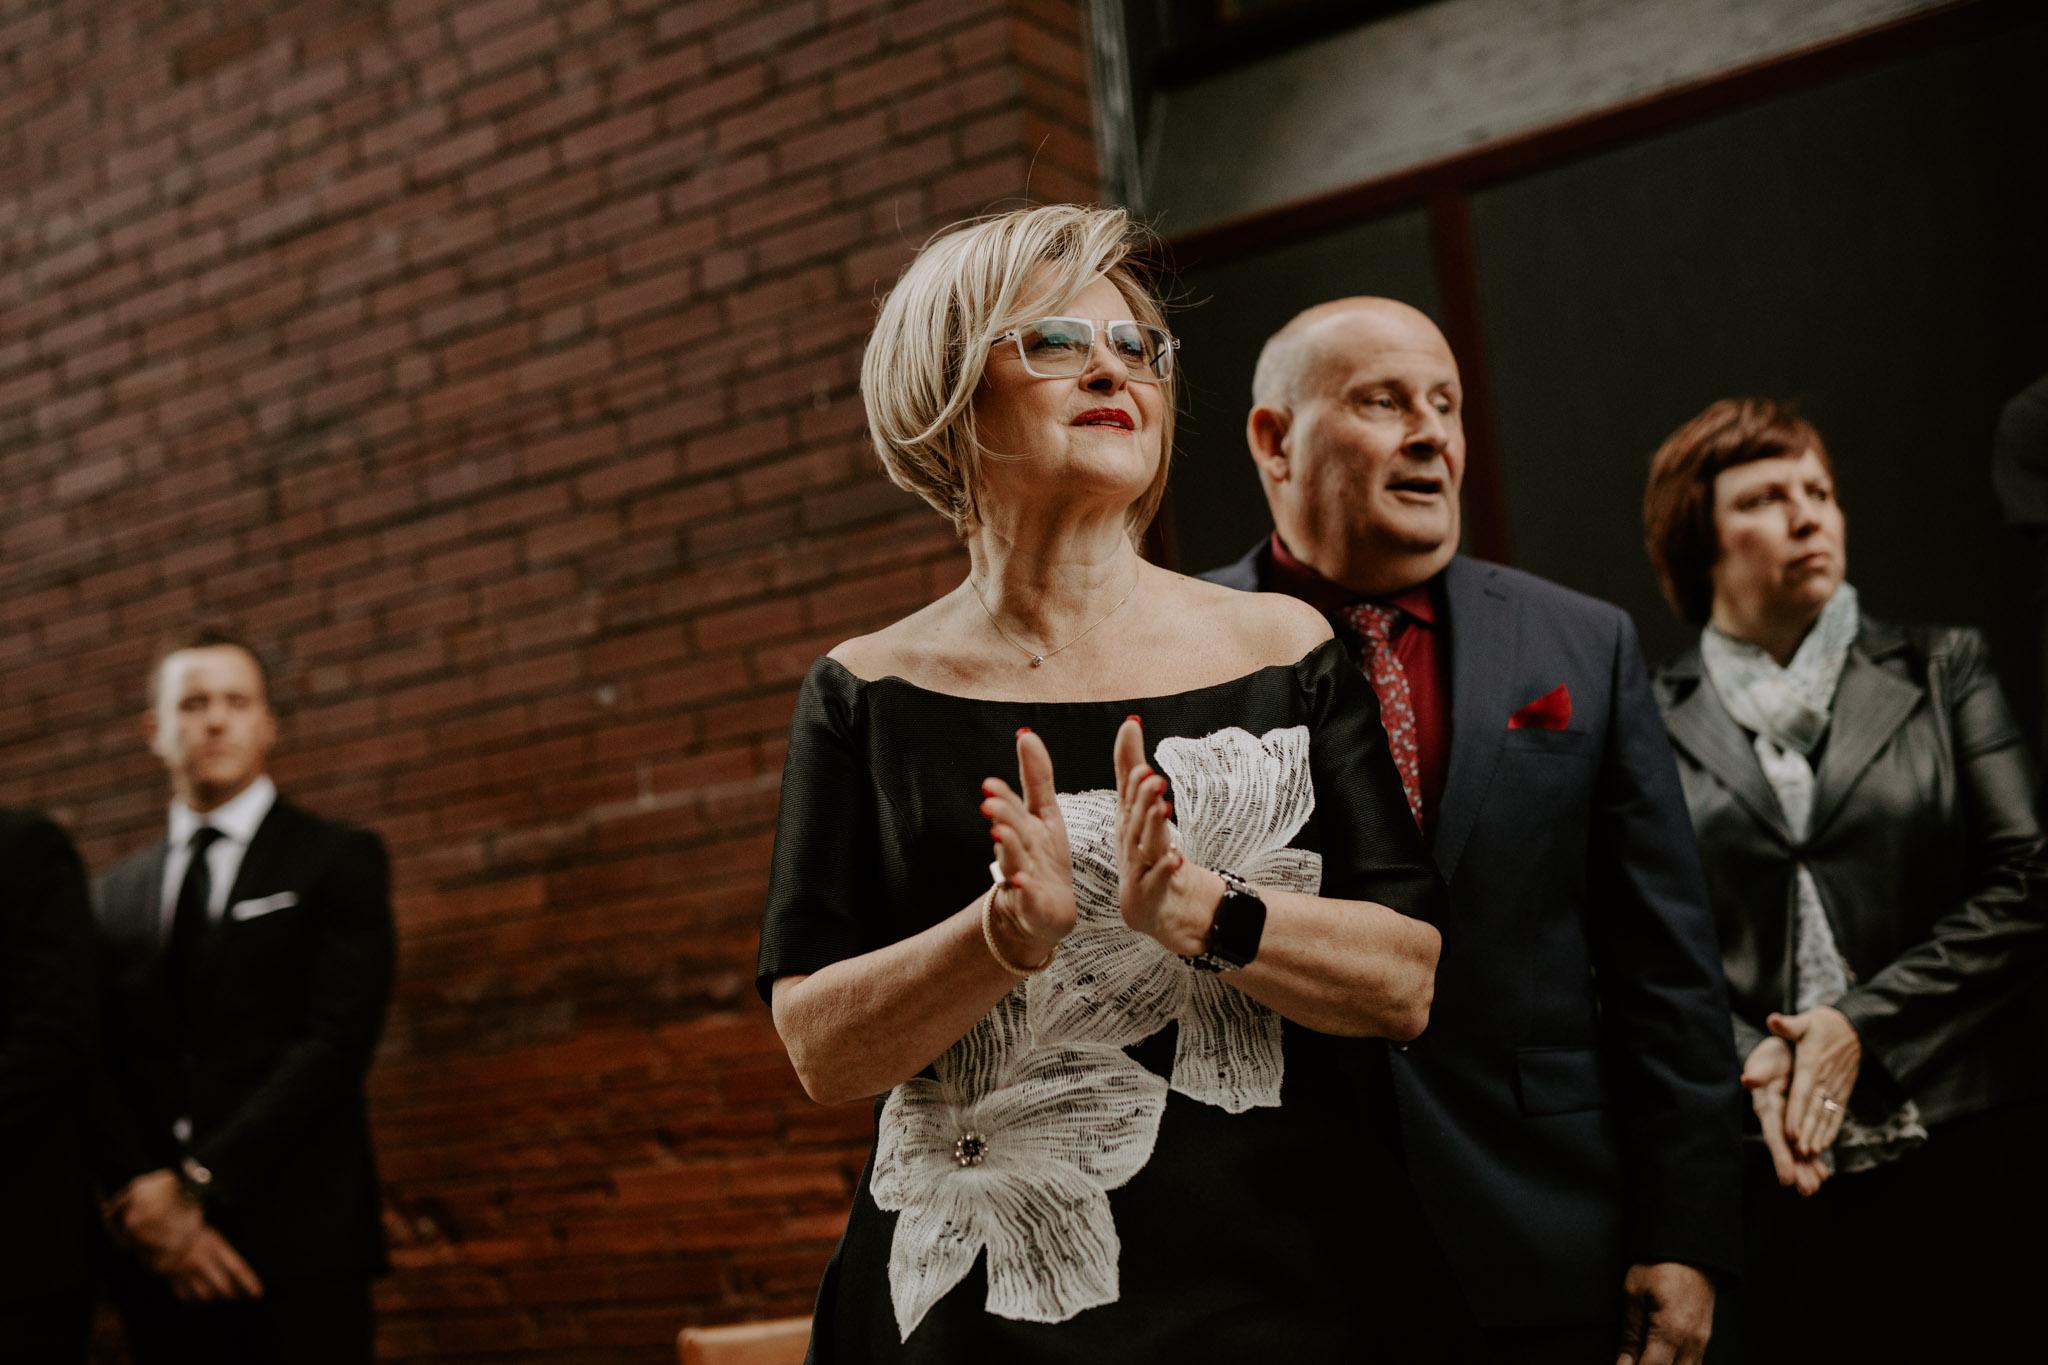 Liberty Village Wedding - bride's mom clapping